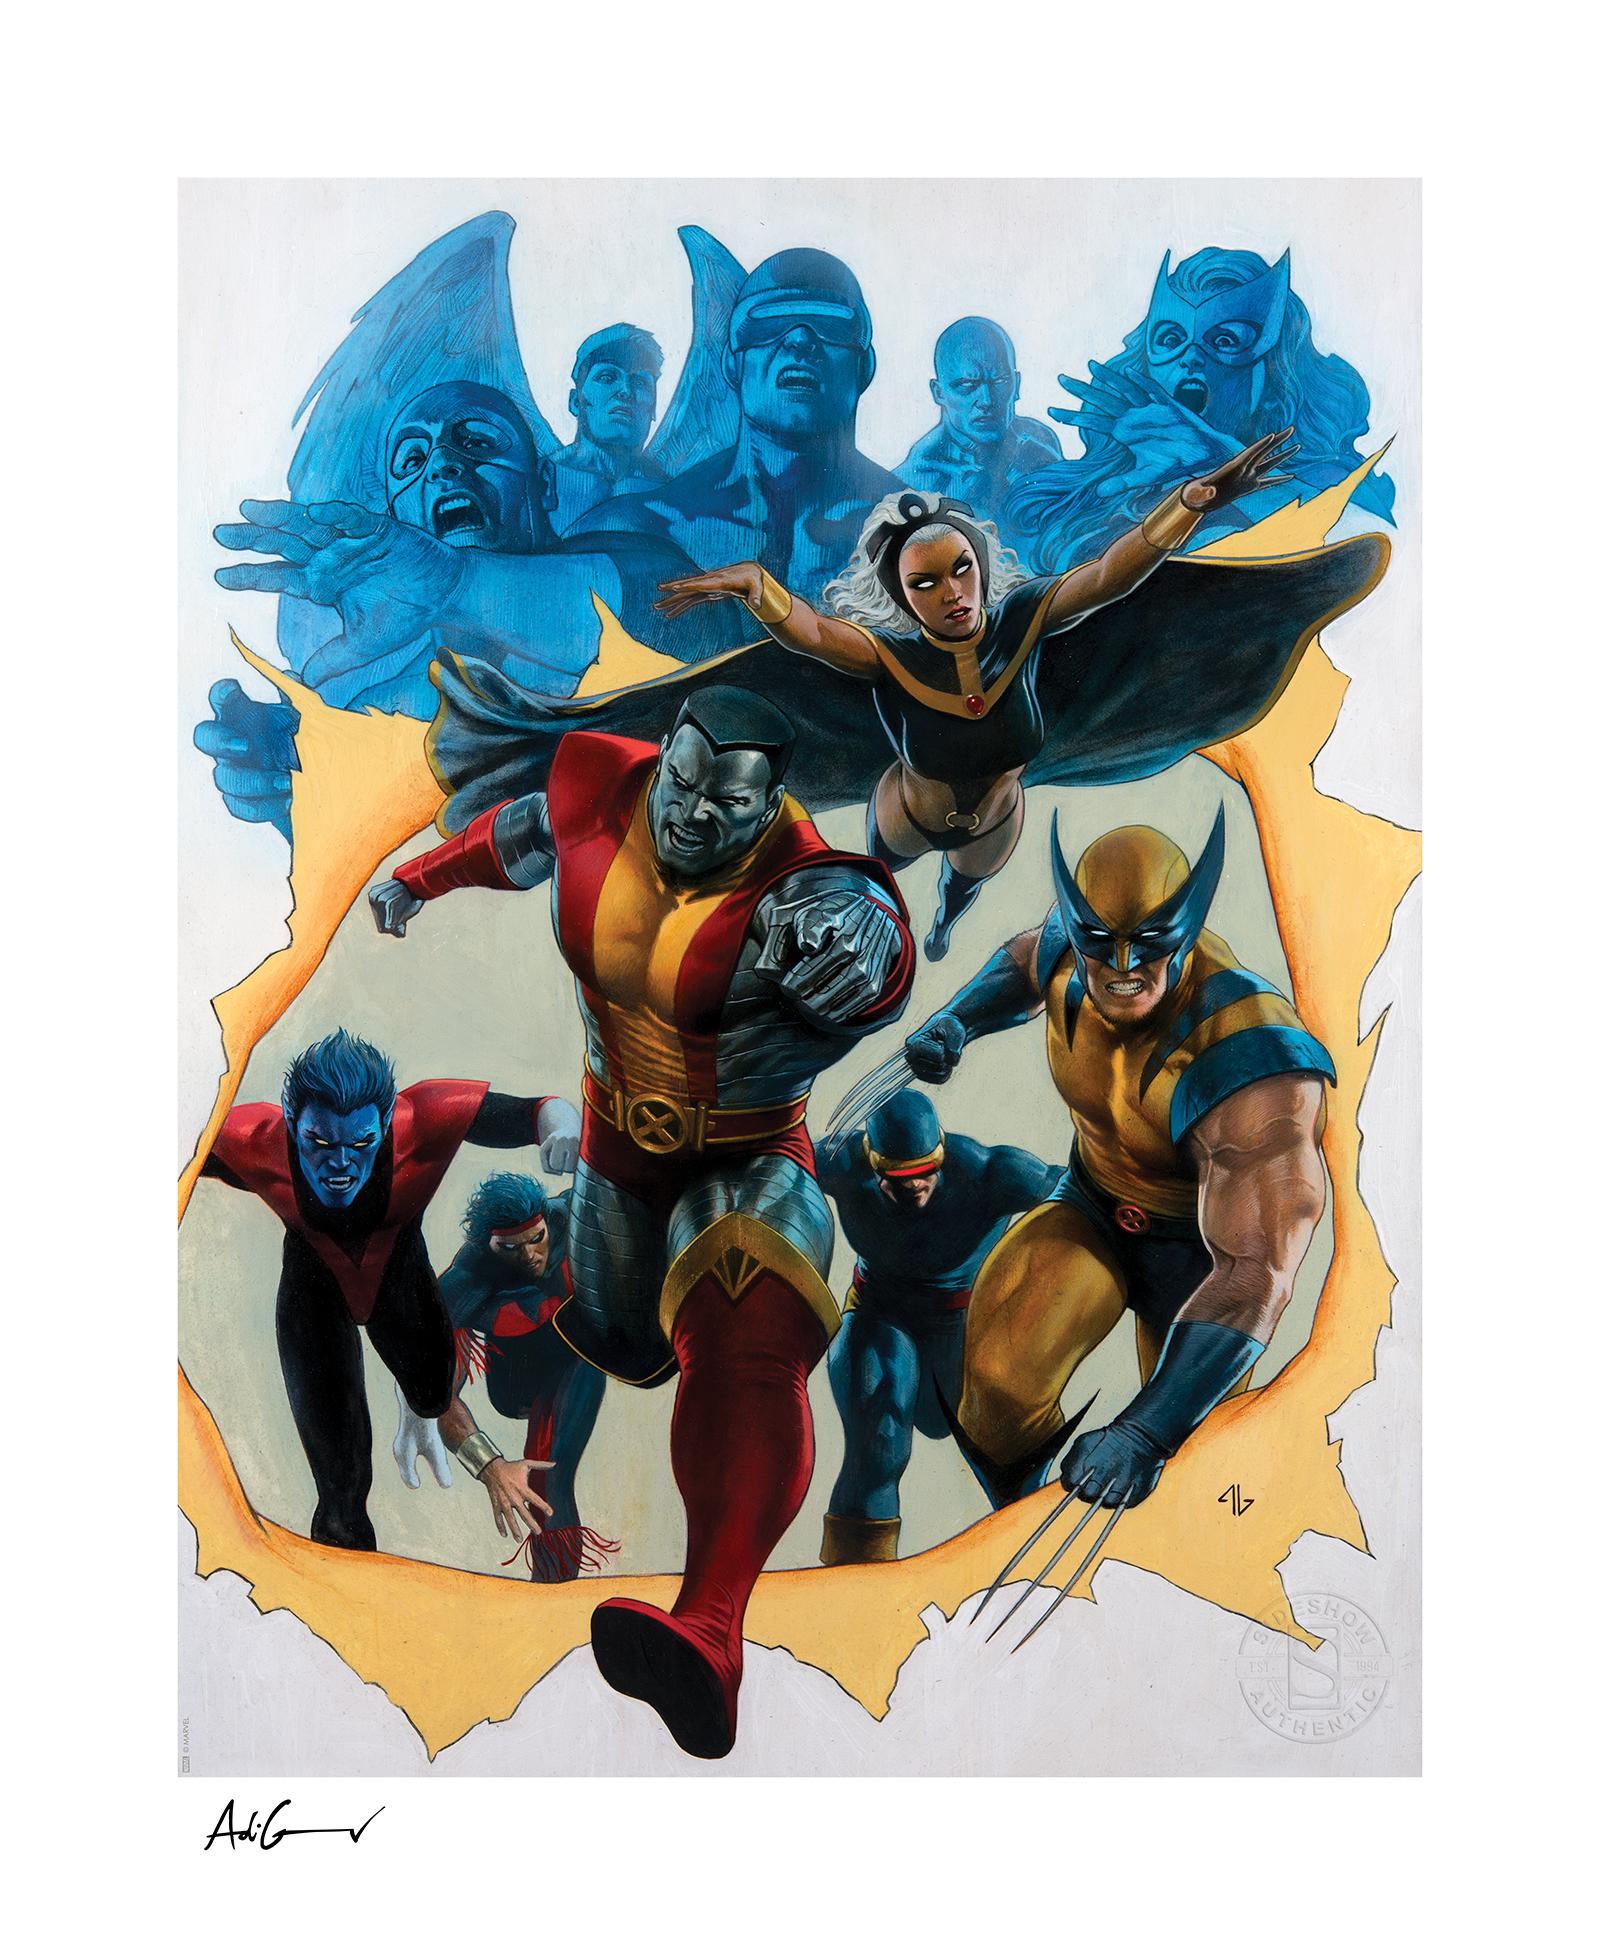 sideshow-marvel-comics-x-men-by-adi-granos-giant-size-exclusive-art-print-toyslife